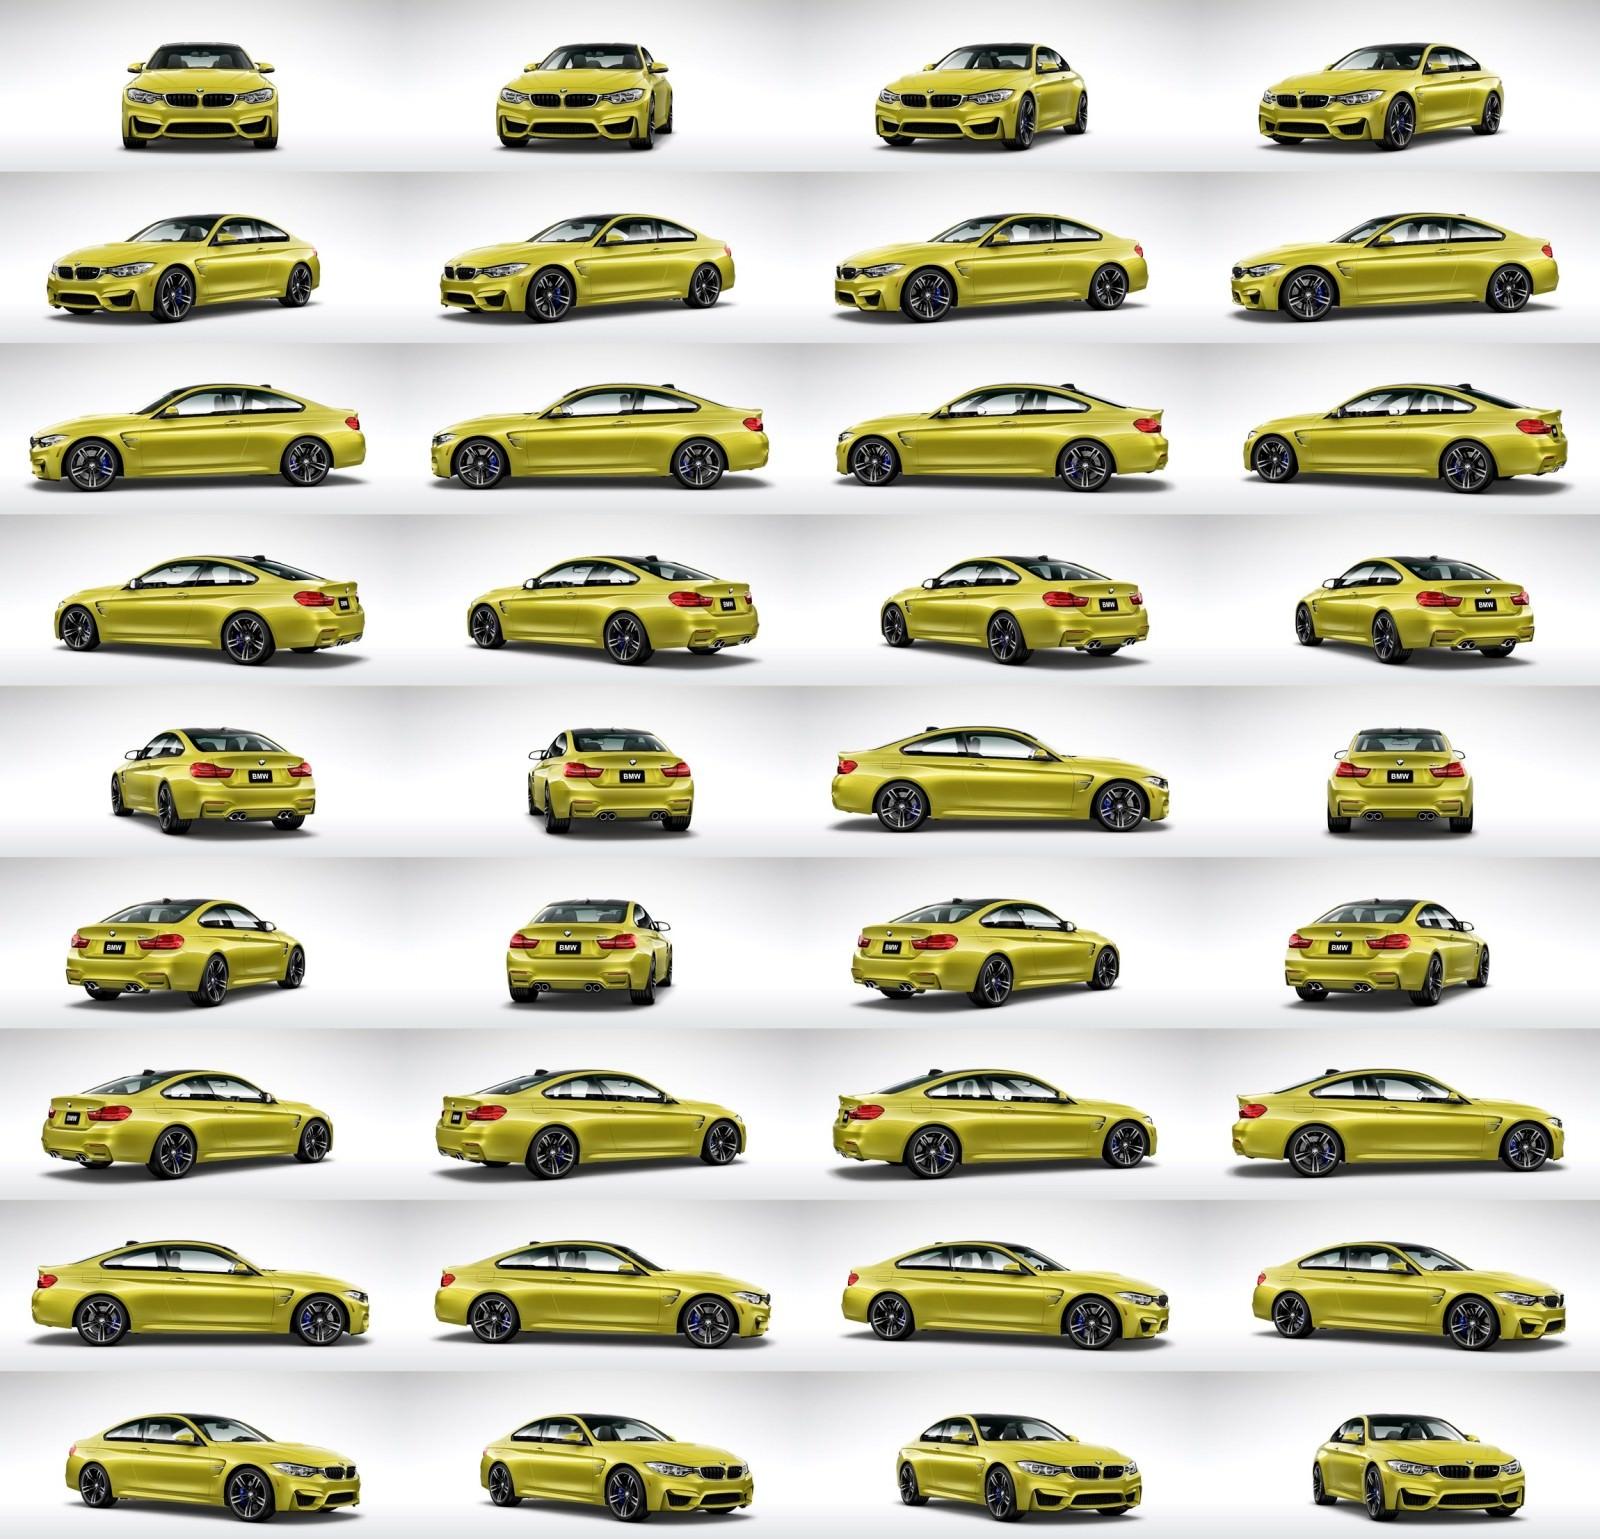 2015 BMW M4 Austin Yellow Metallic